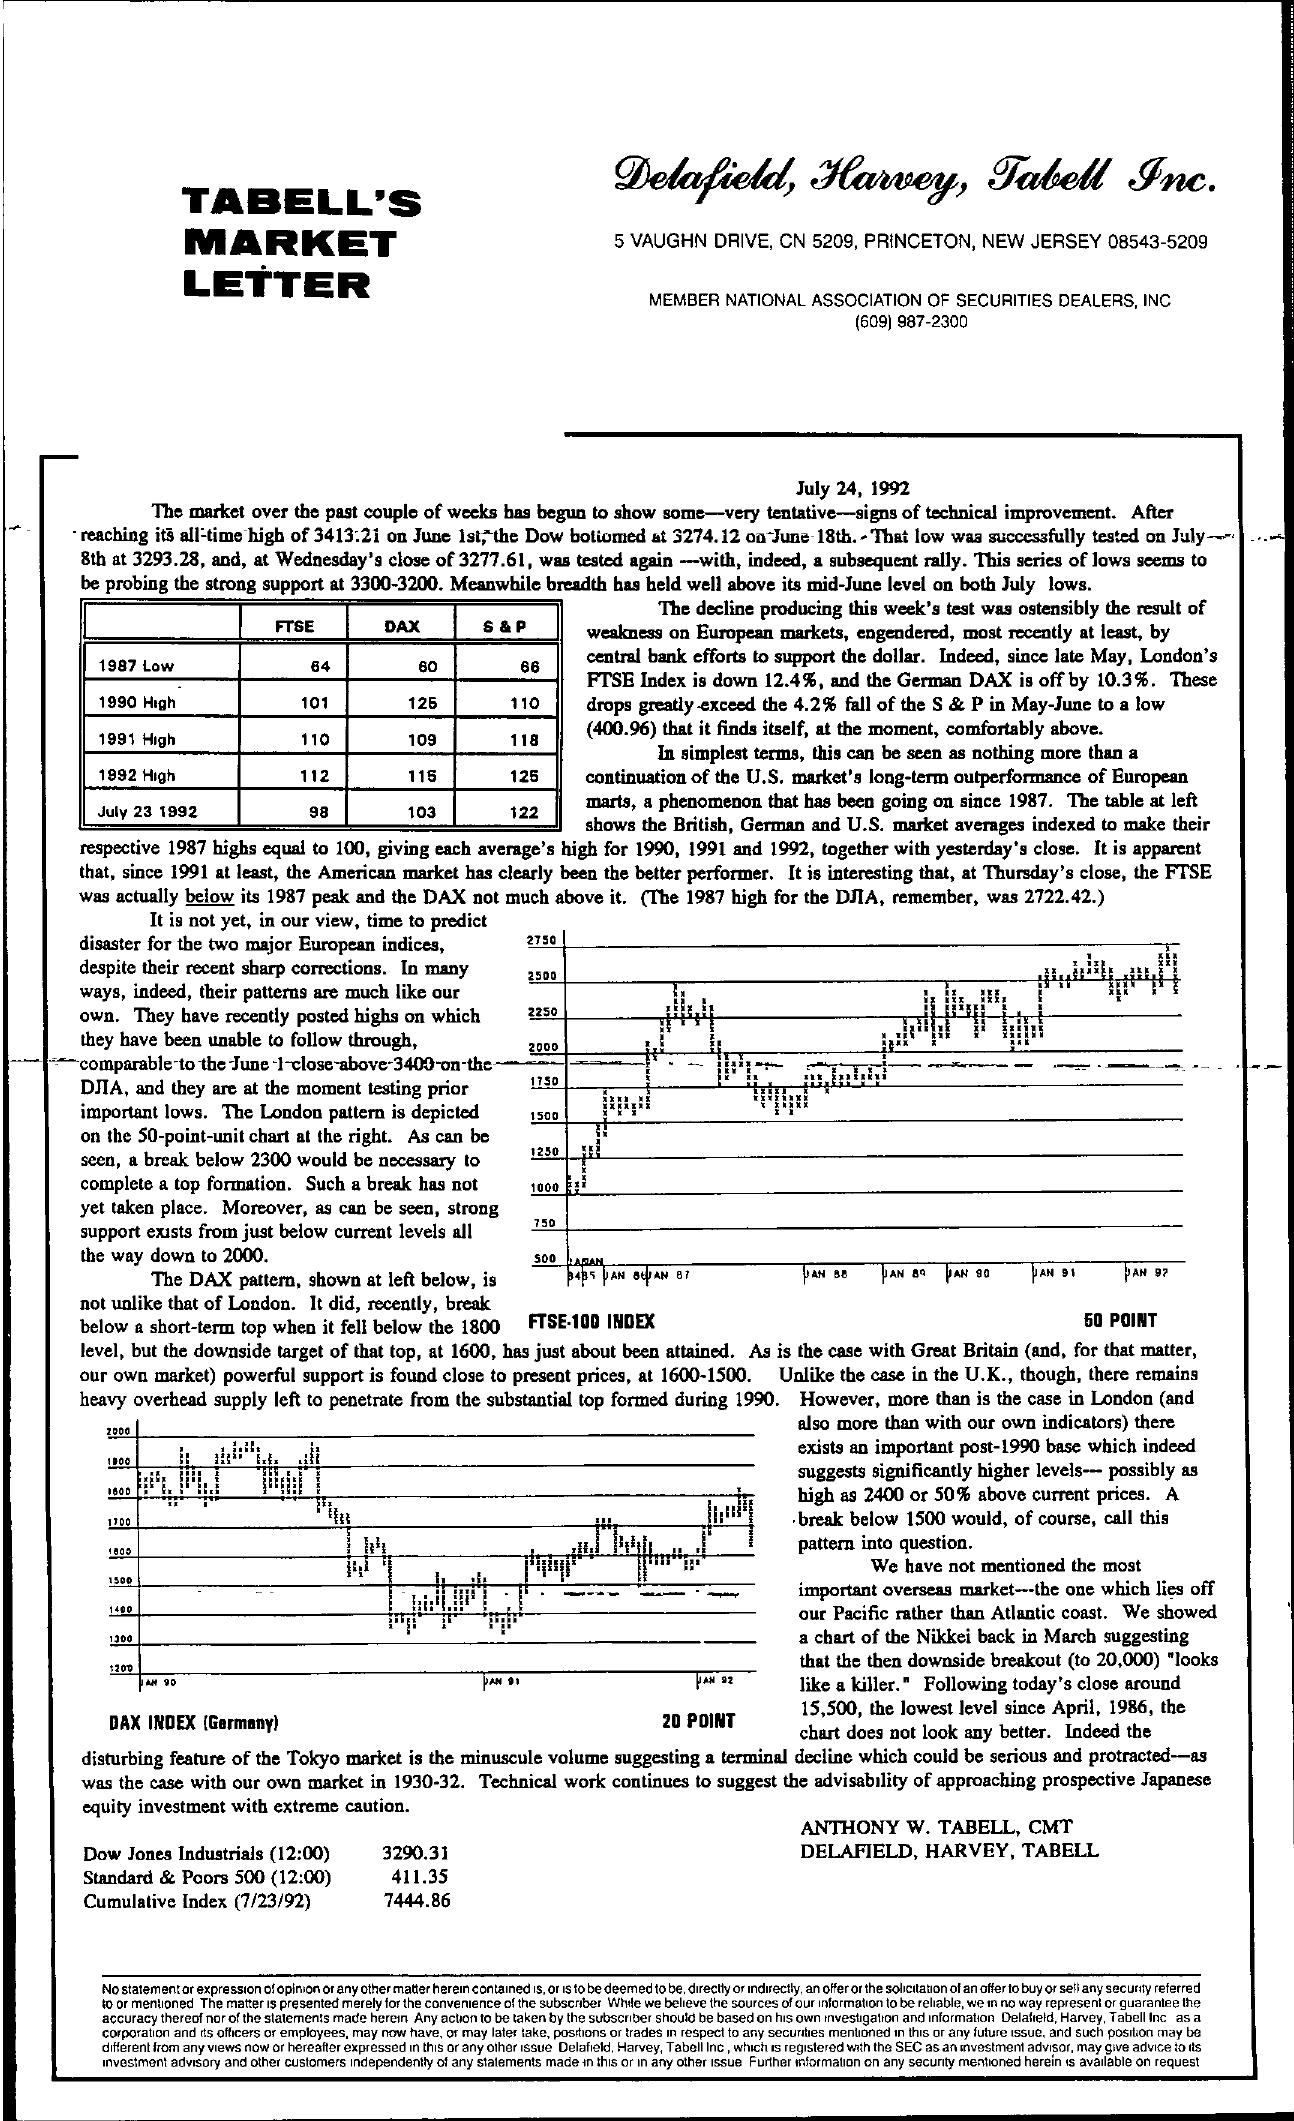 Tabell's Market Letter - July 24, 1992